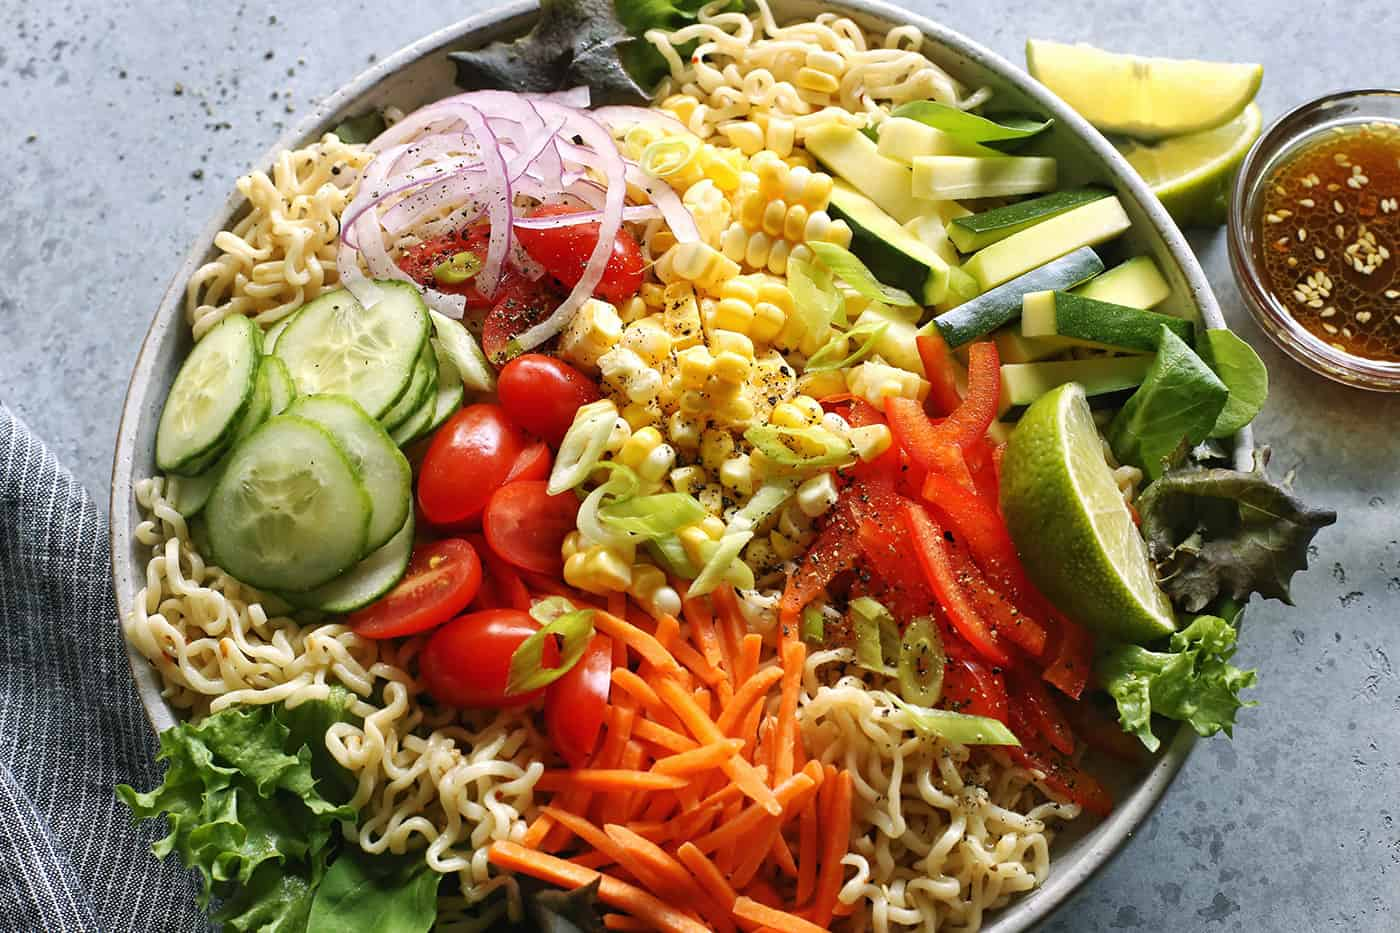 a light gray bowl full of veggies and ramen noodles